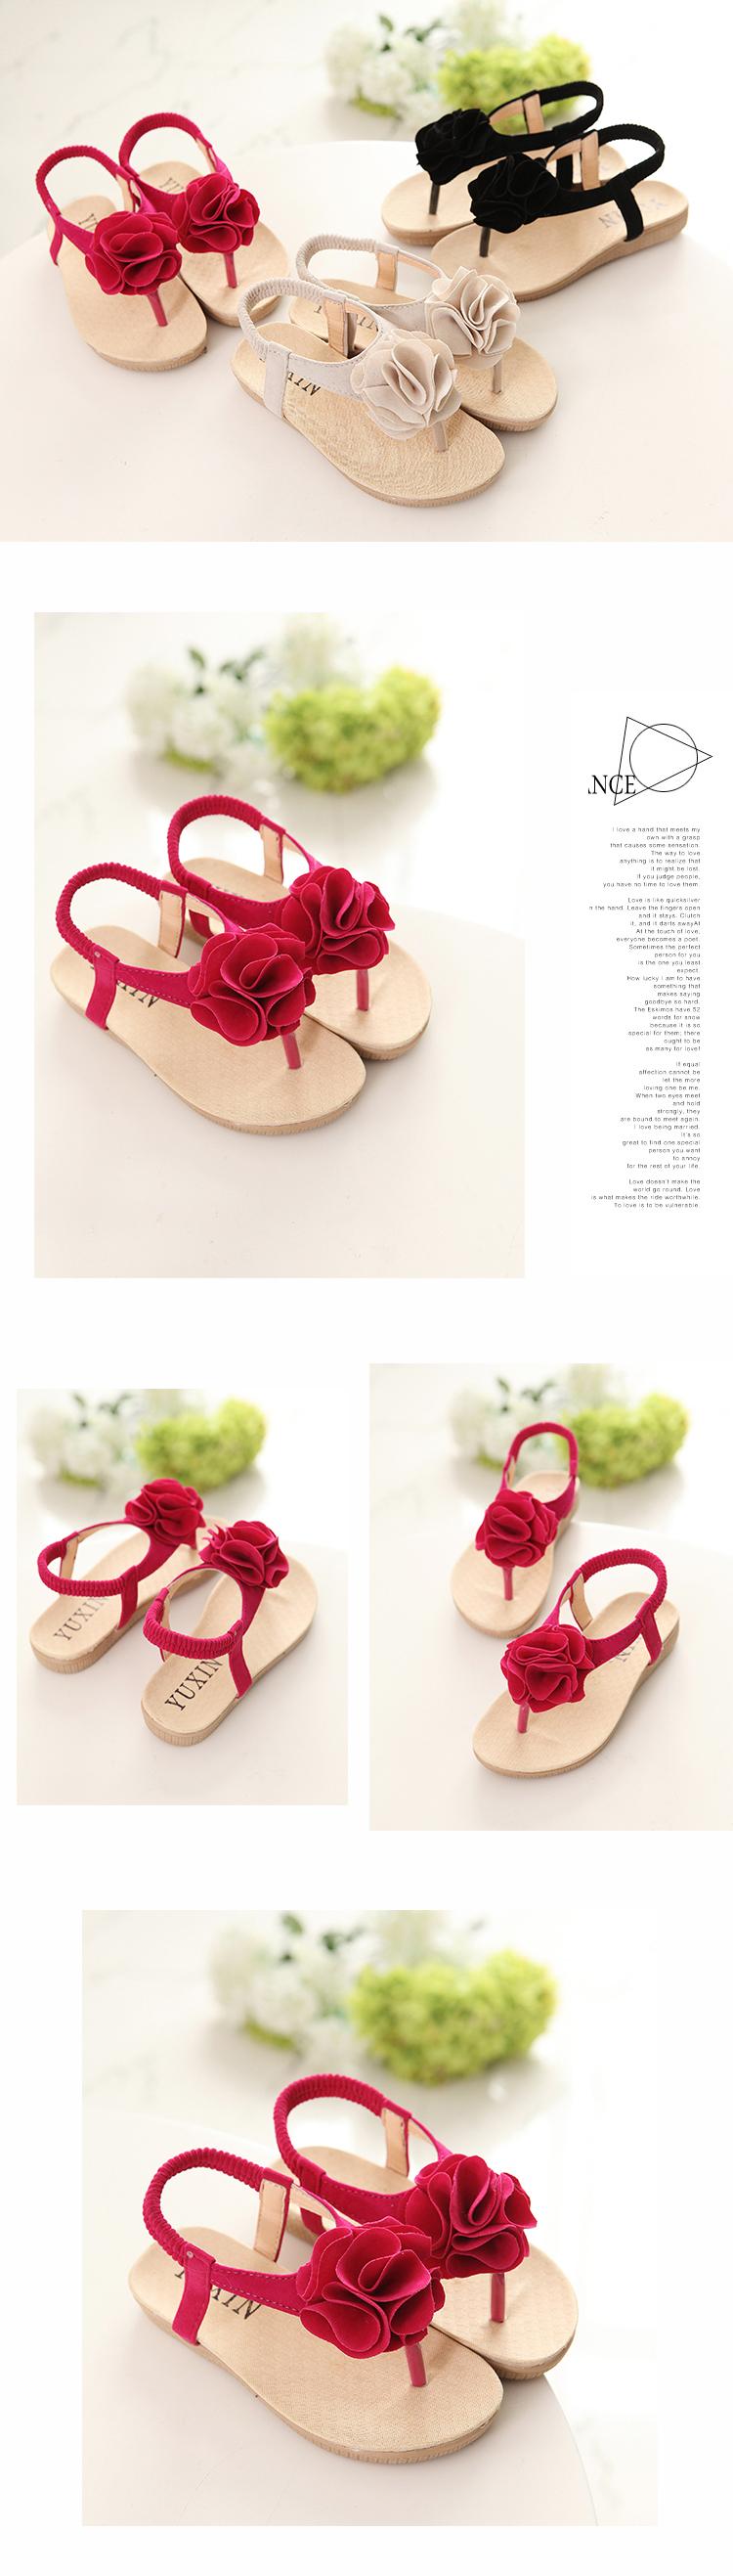 d37f3e28f ... 2017 Spring New children Non-slip shoes Girl Princess shoes Kids  fashion banquet leather shoe Kids wedding High heel shoes black US   13.68   piece